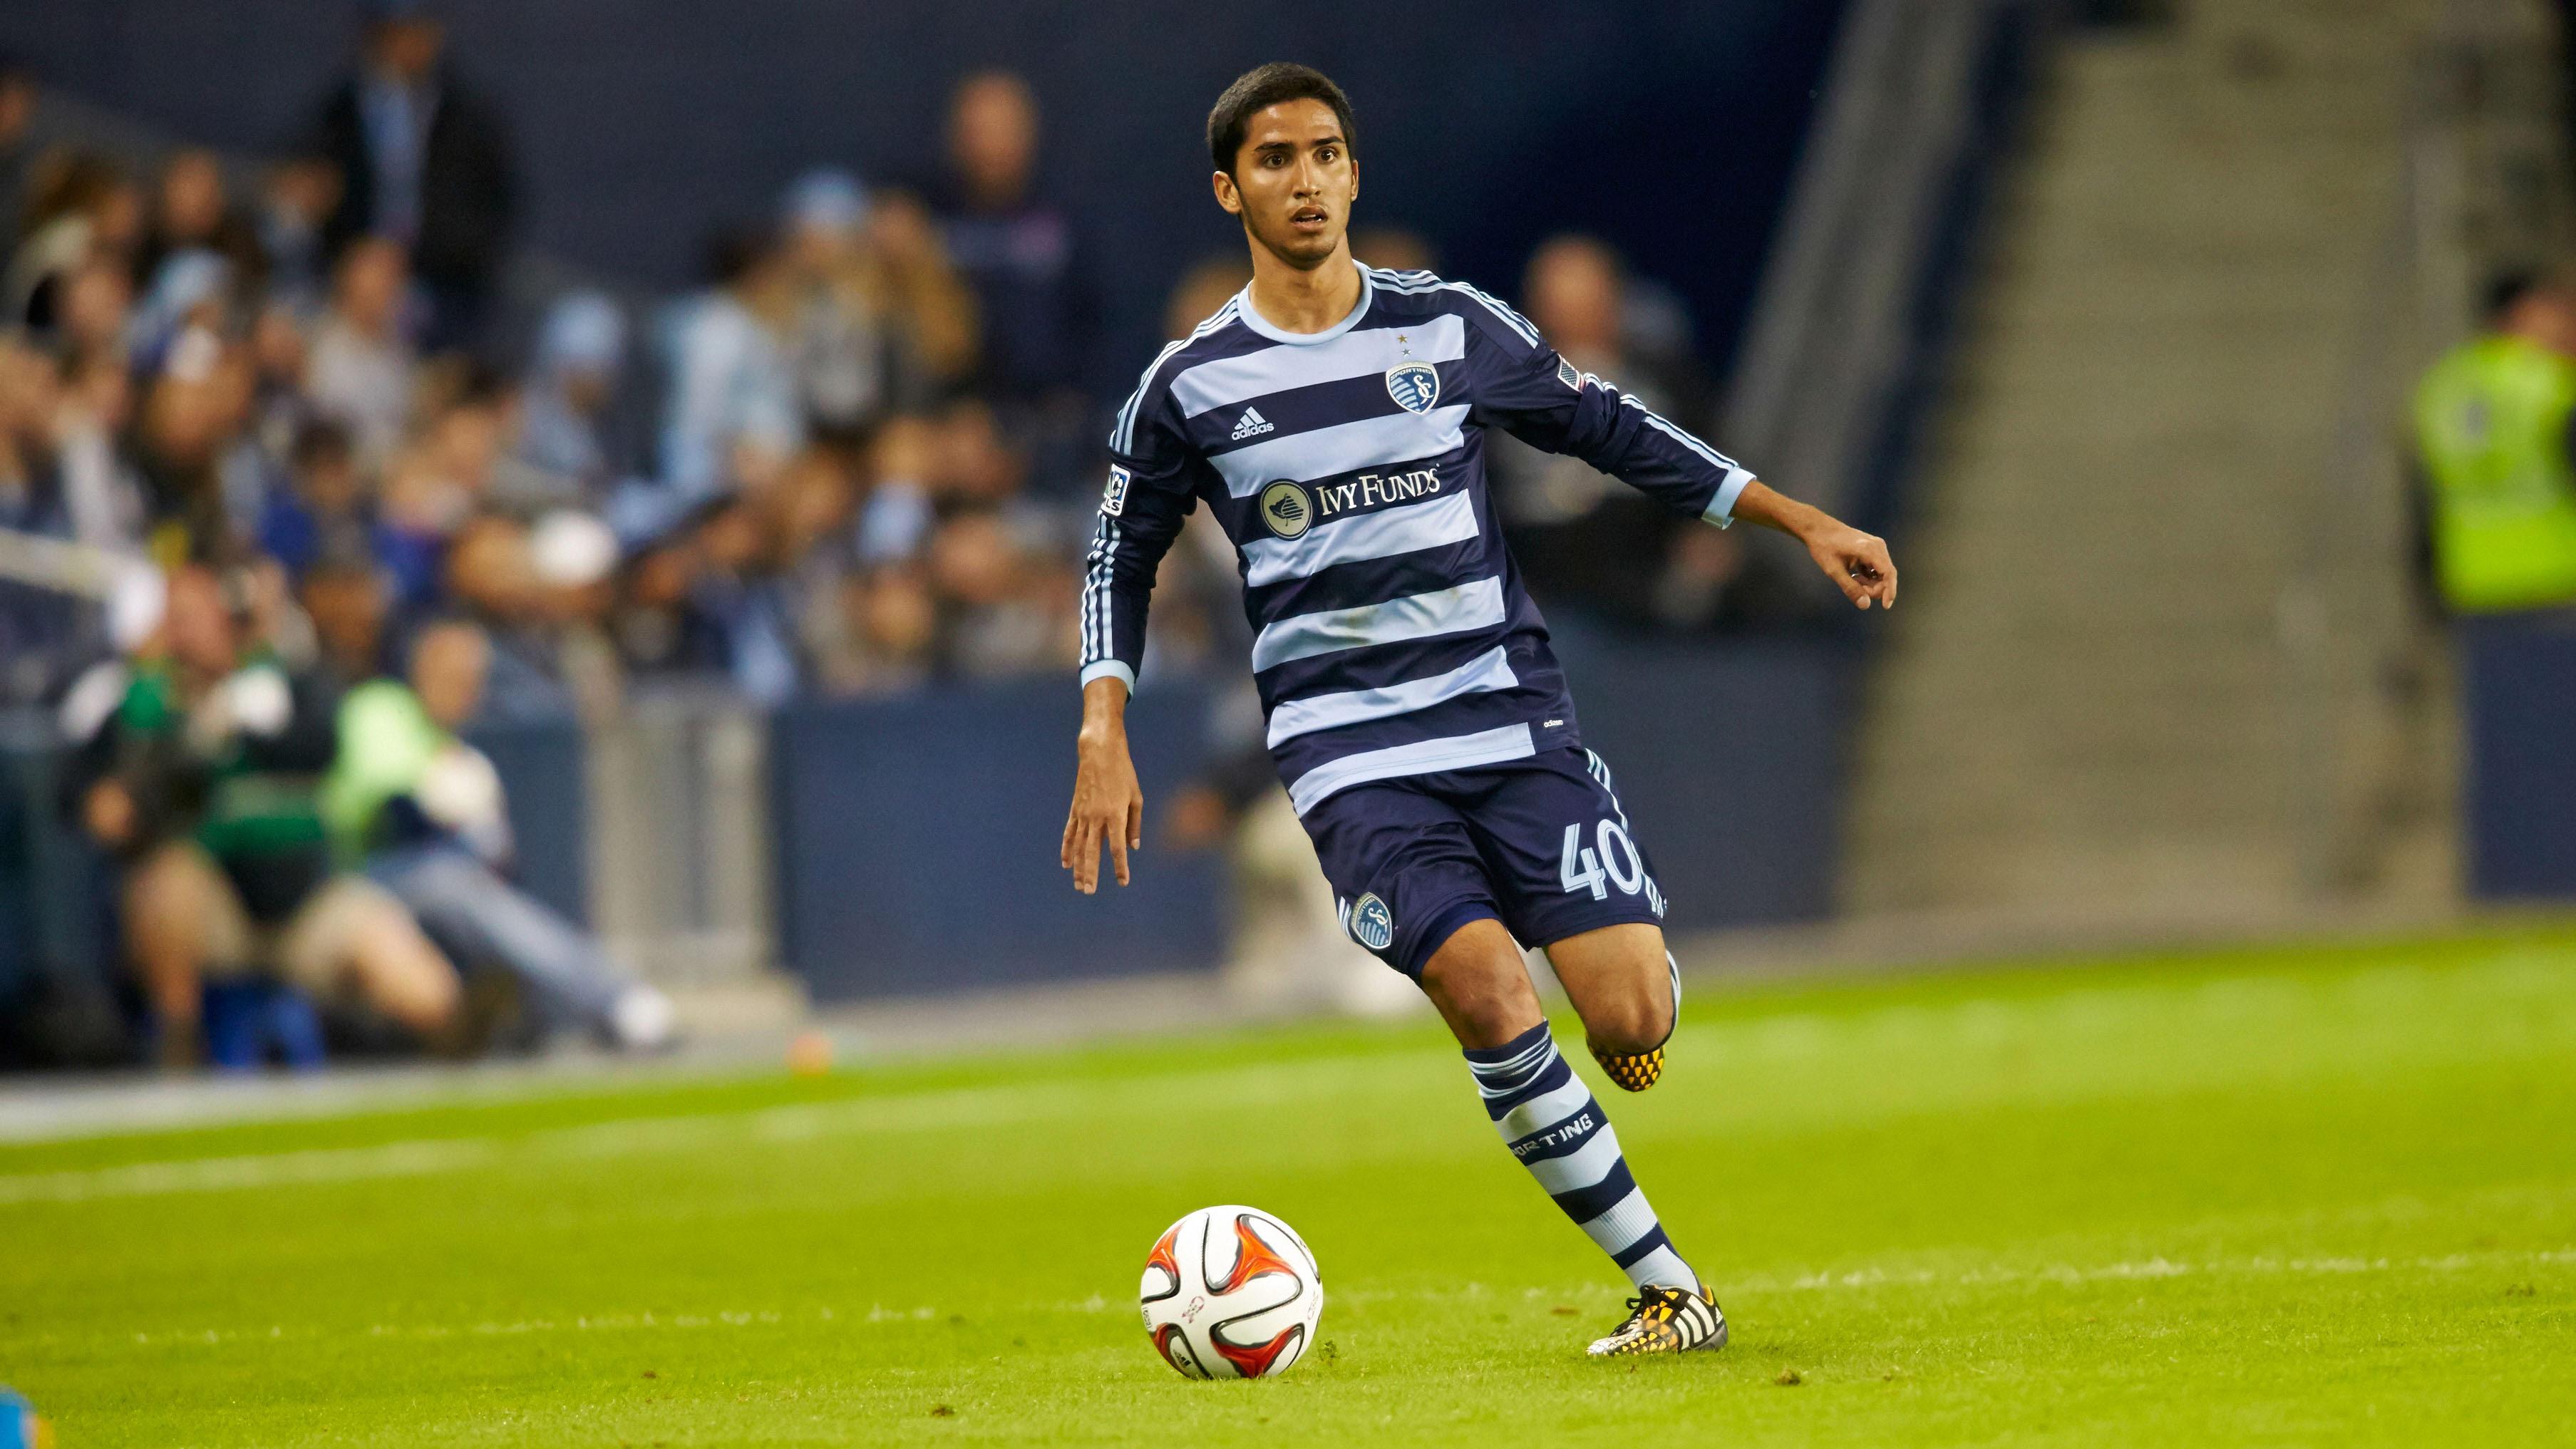 Sporting KC gets Igor Juliao back on loan from Brazilian club